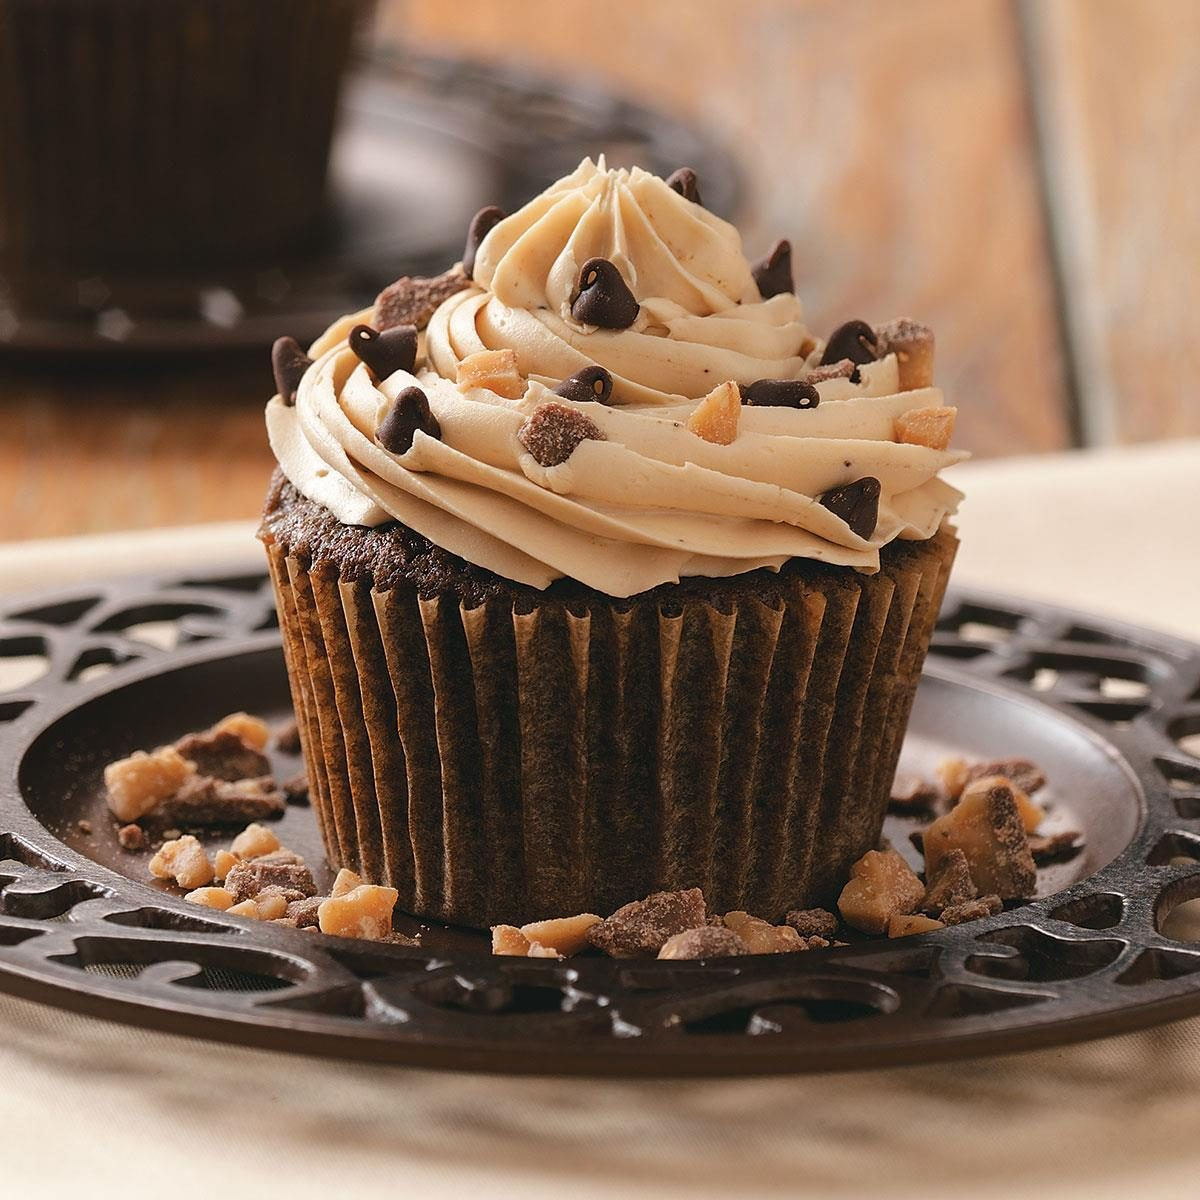 Toffee Mocha Cupcakes